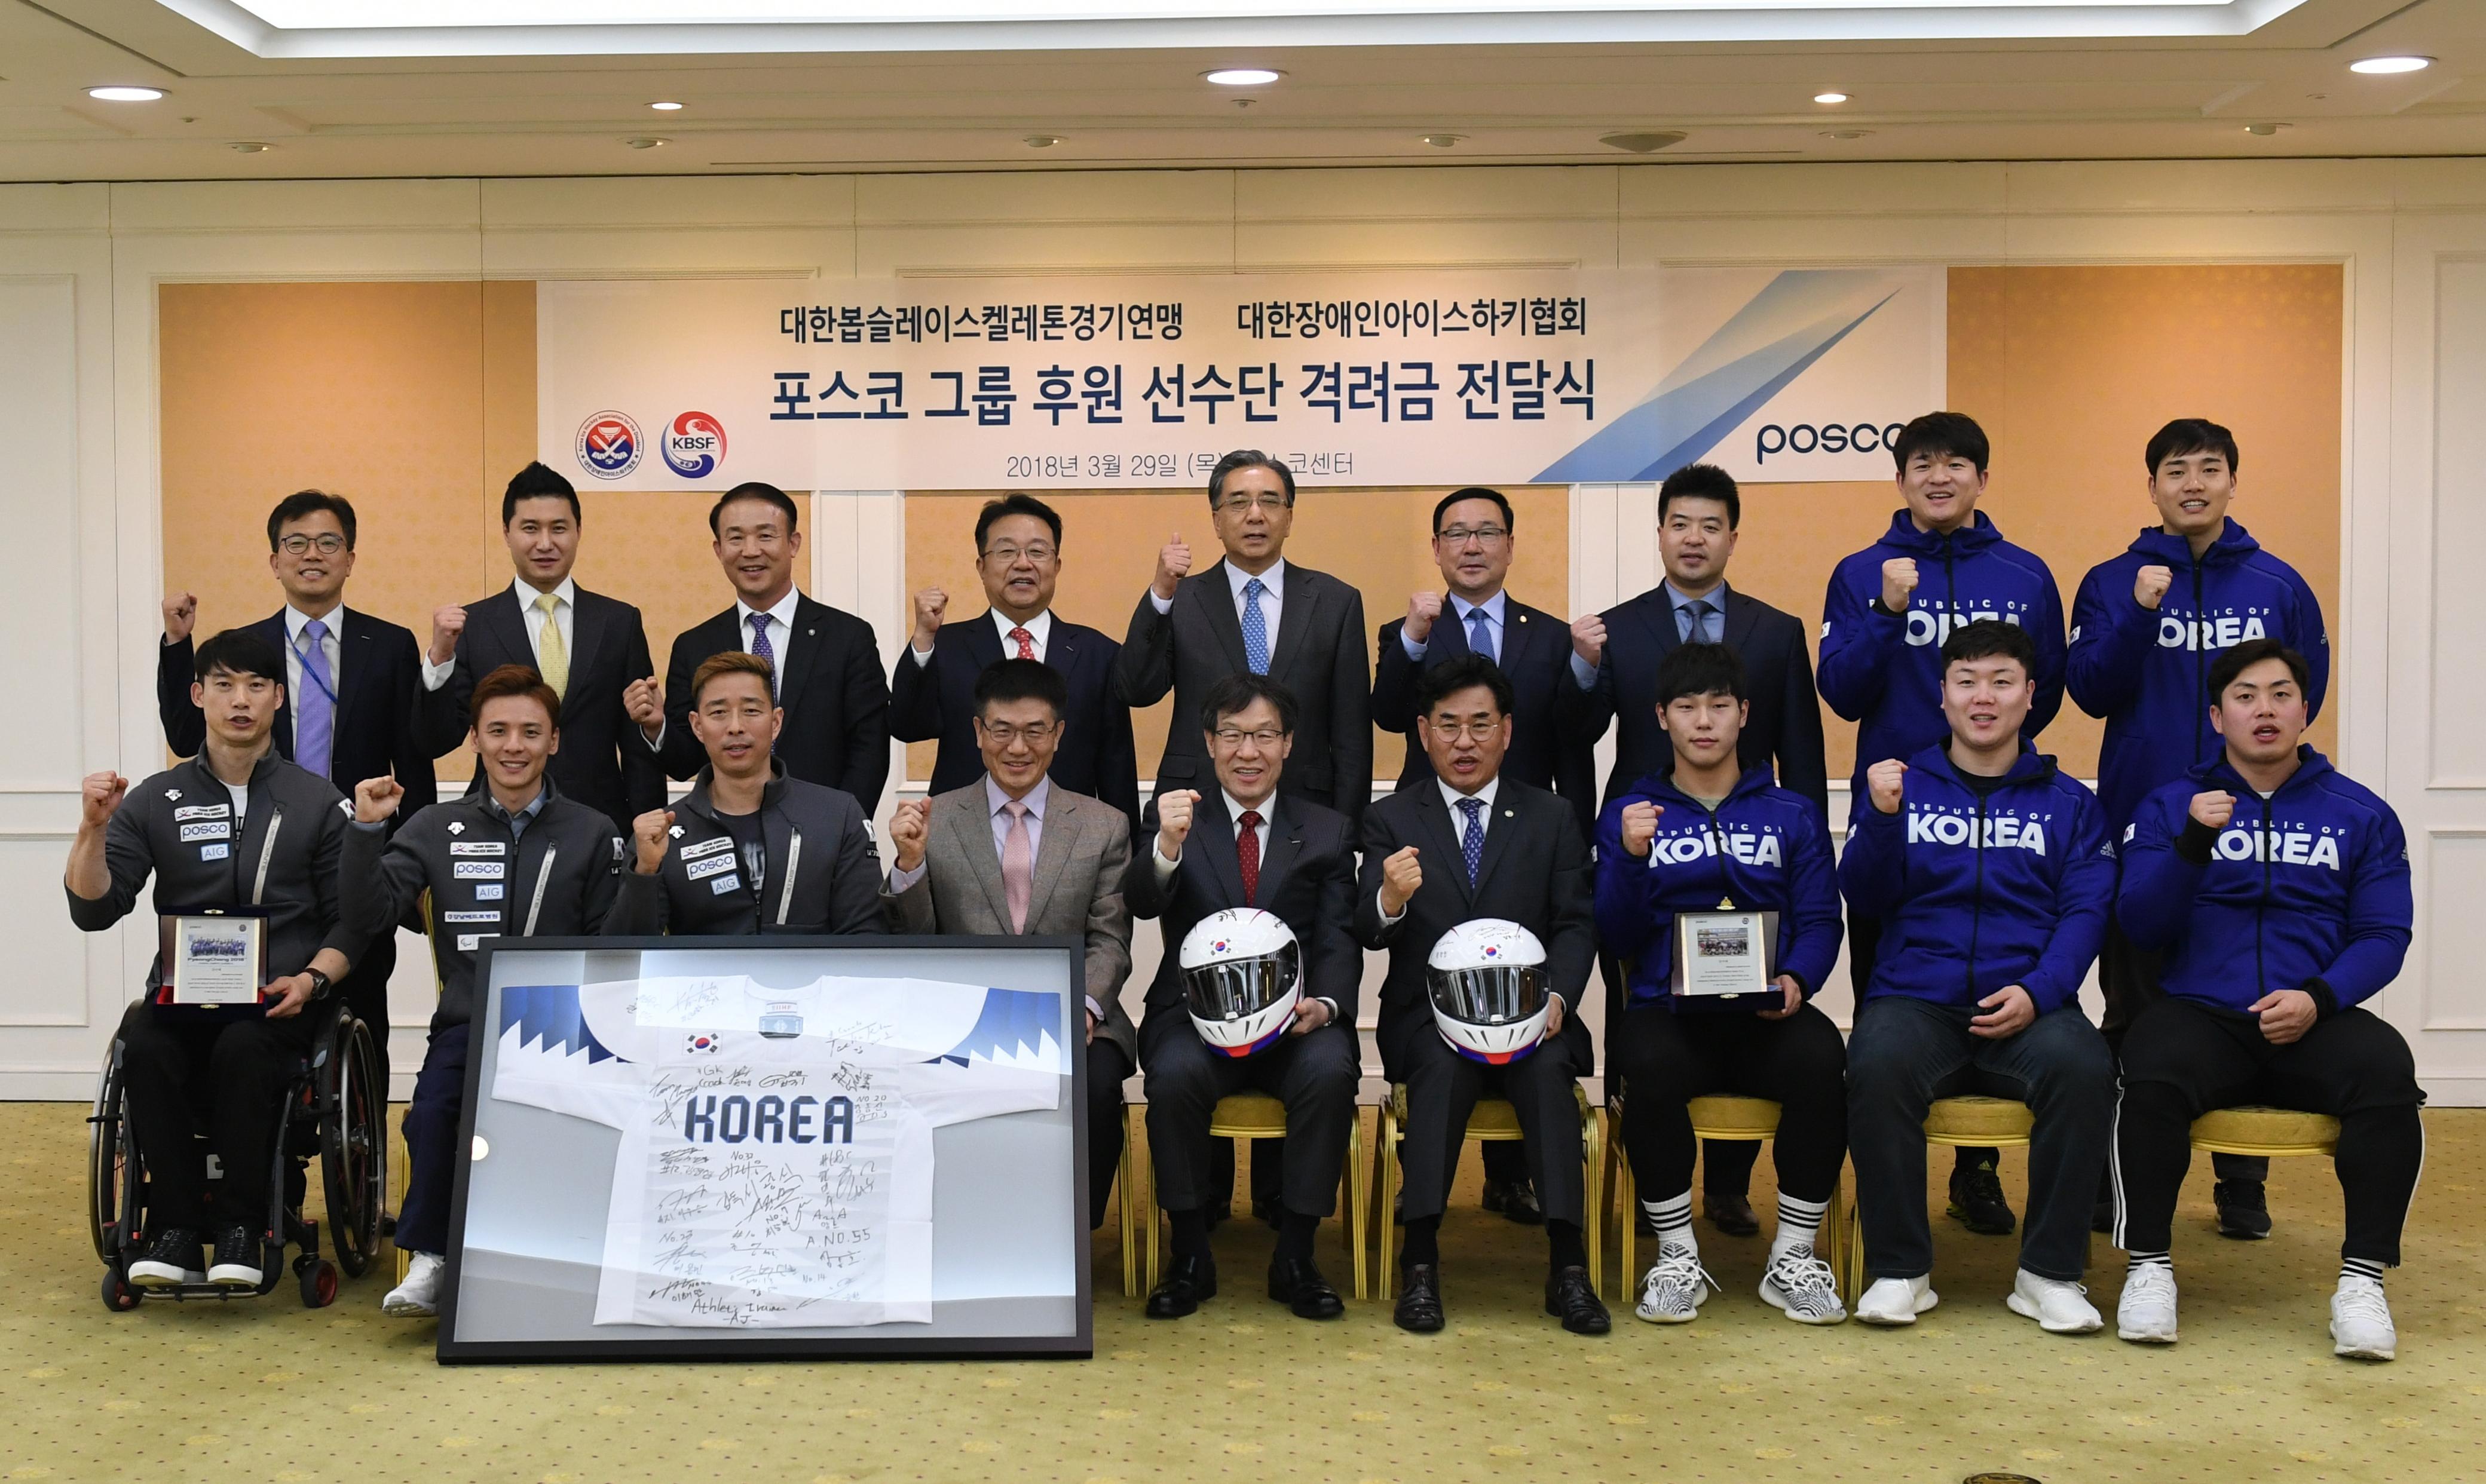 Koreanparalympiccommitte